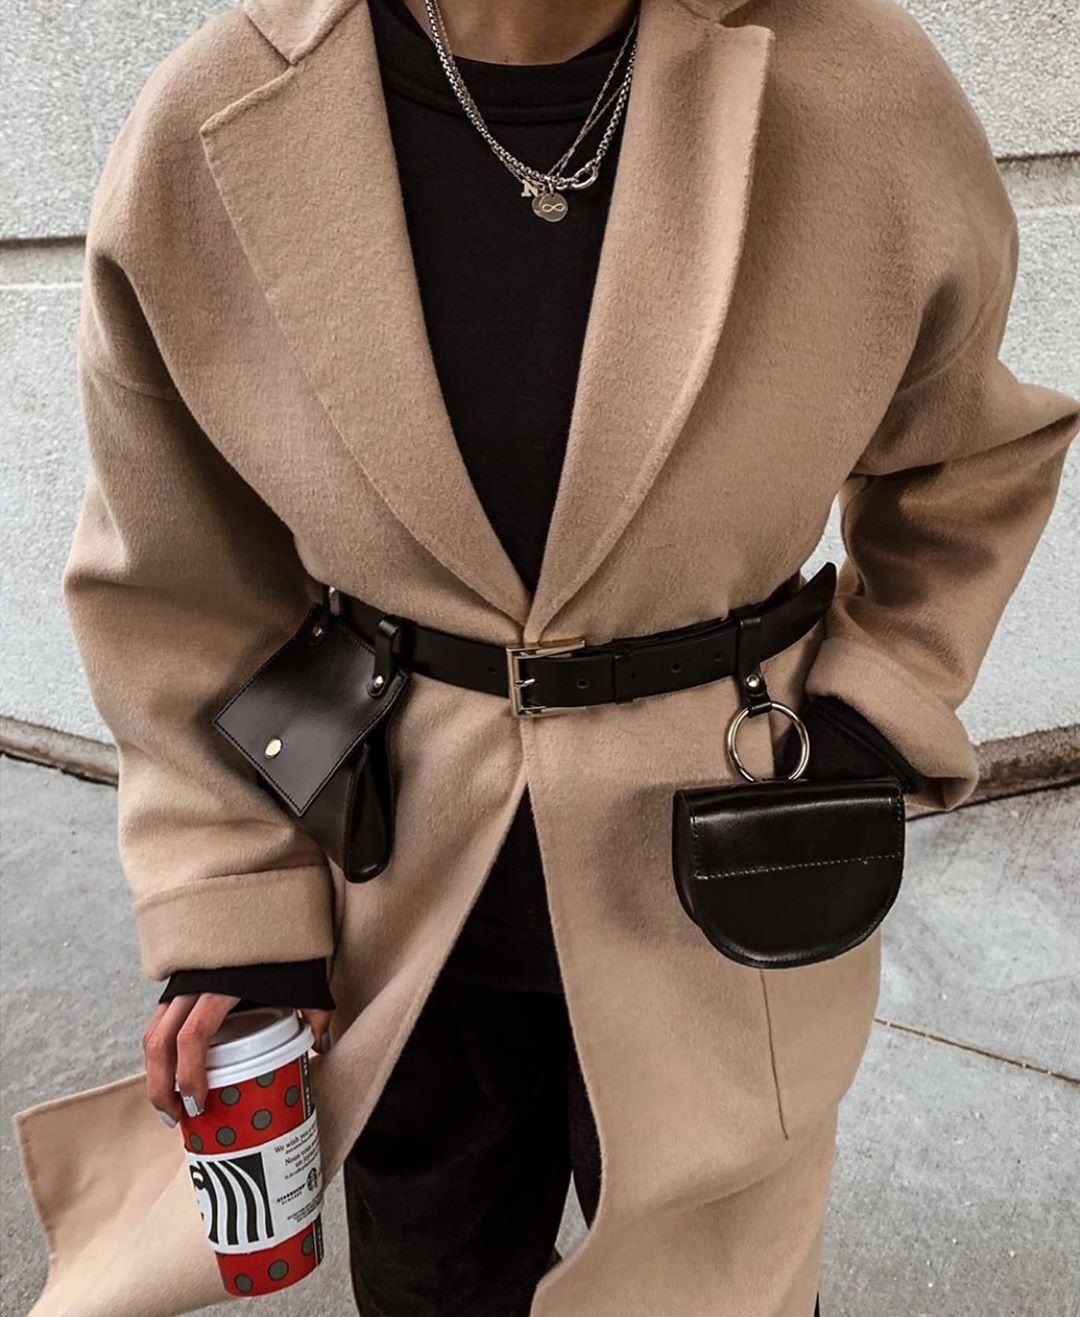 manteau avec poches plaquées de Zara sur zara.mania